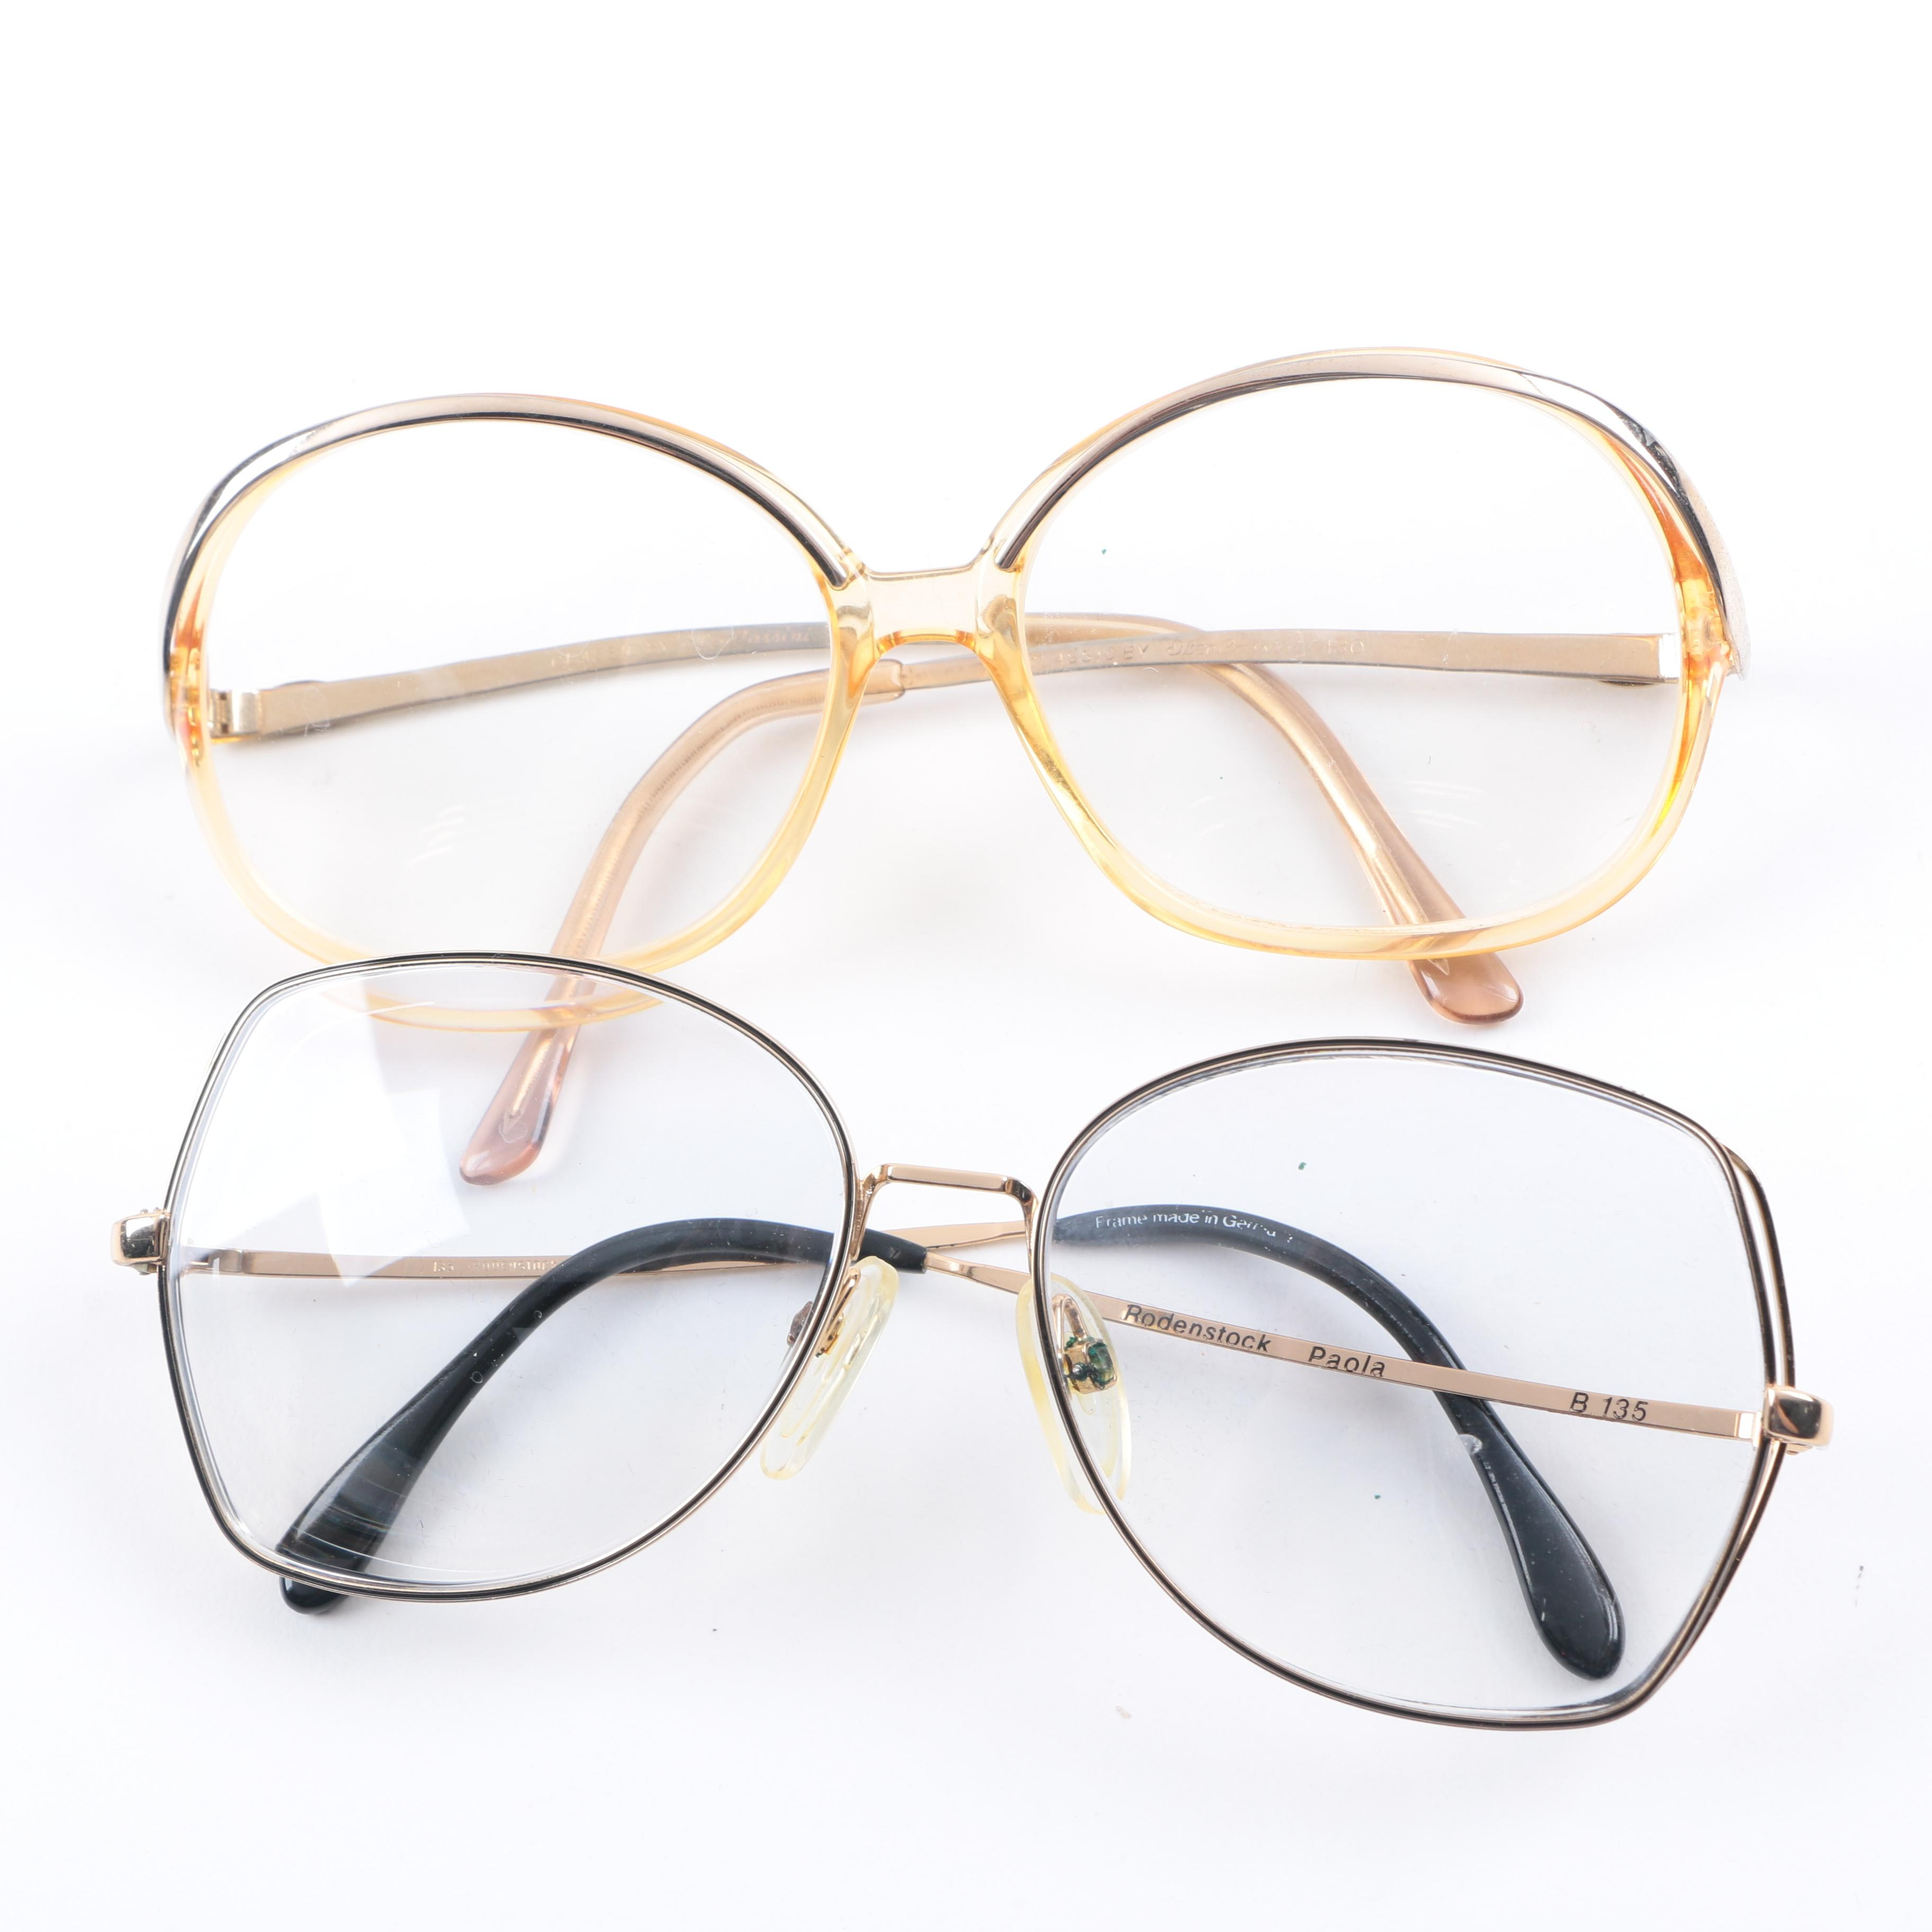 Prescription Vintage Glasses Including Rodenstock and Oleg Cassini